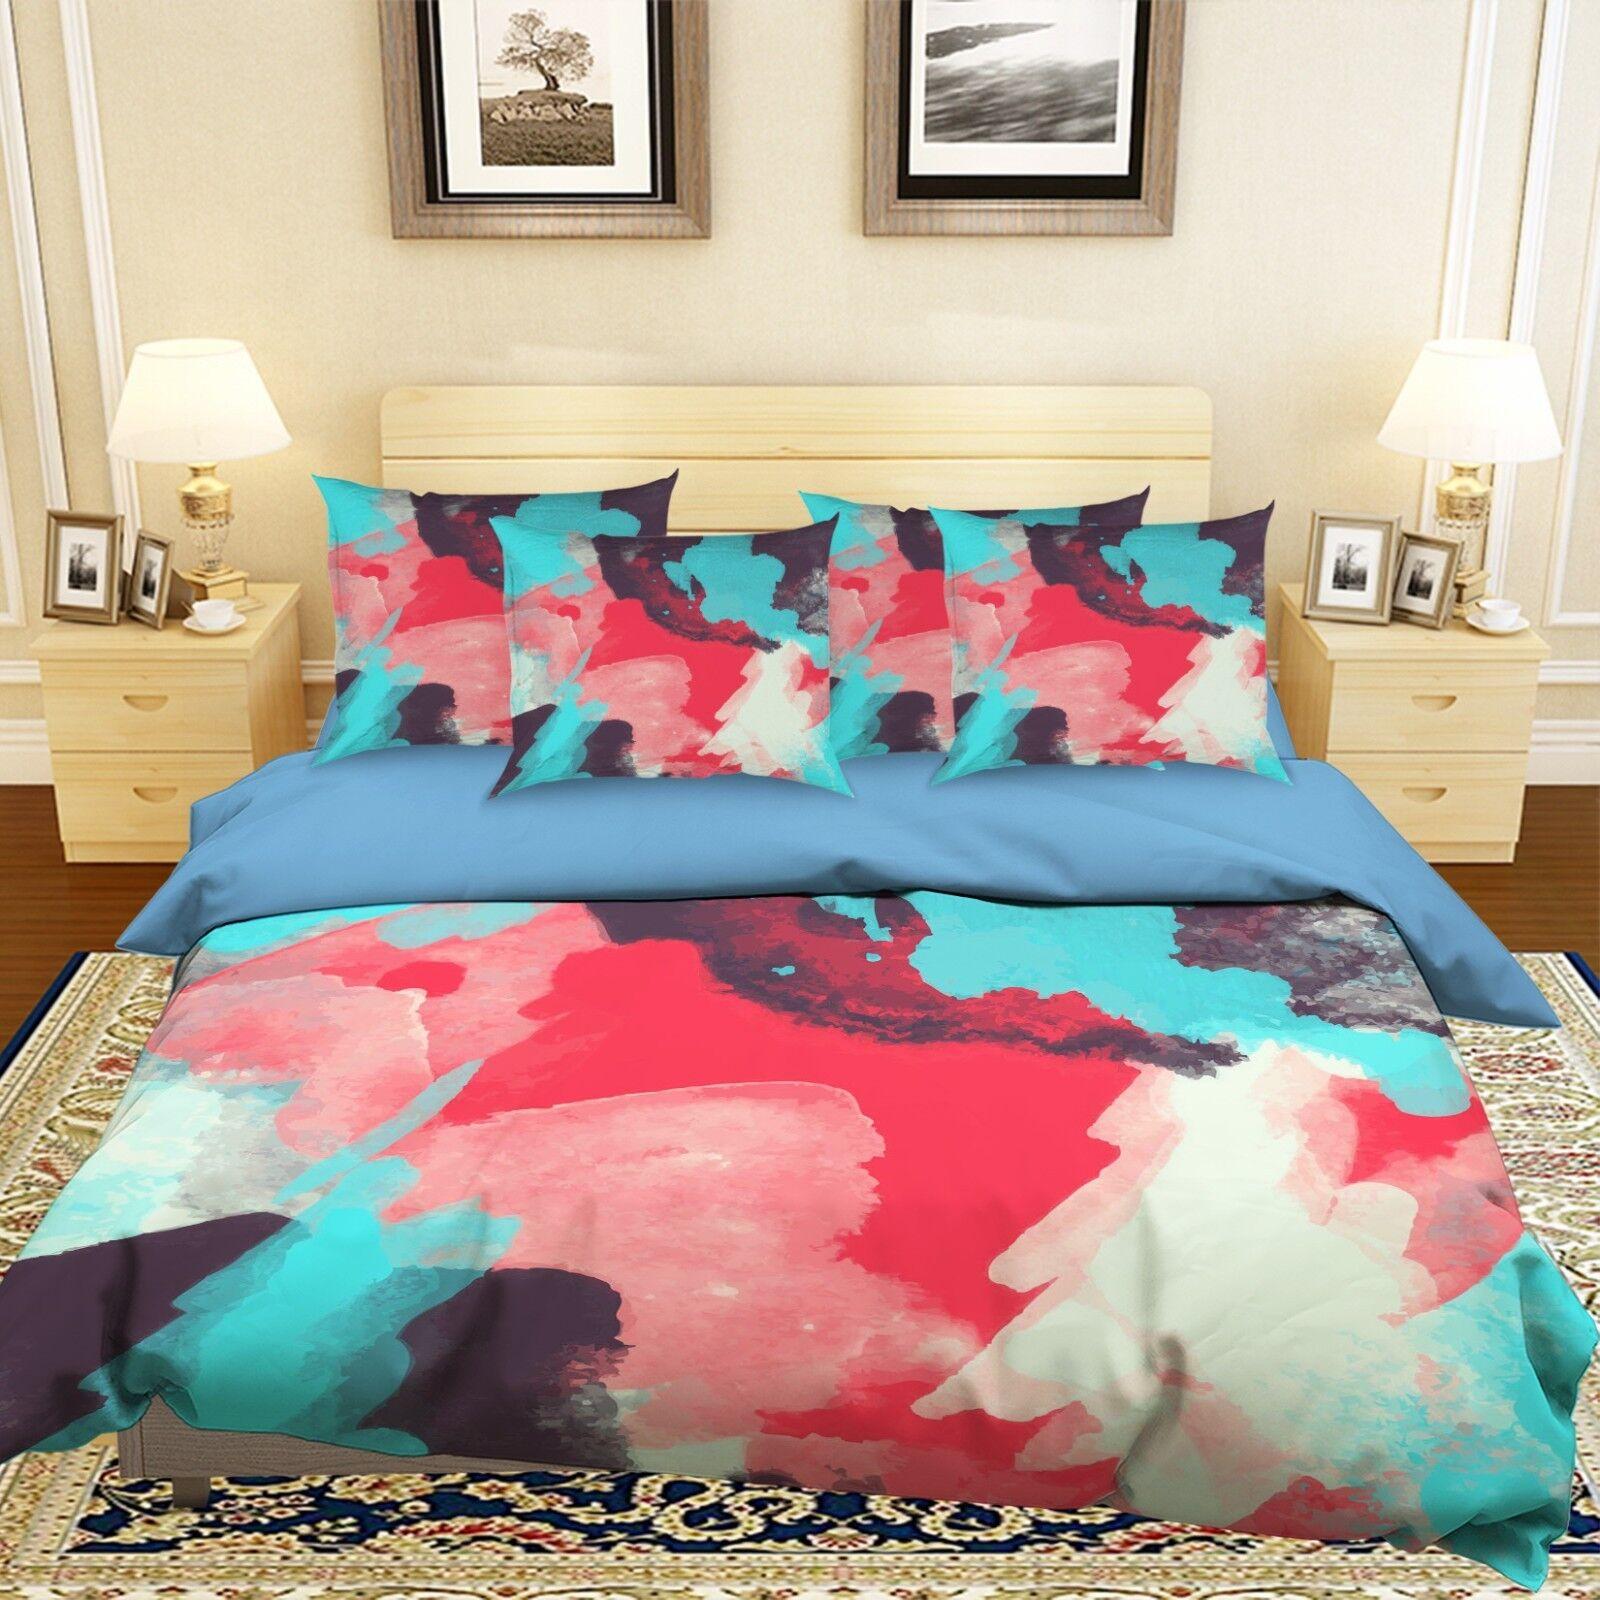 3D Coloree Painting 484 Bed Pillowcases Quilt Duvet Cover Set Single Queen King AU